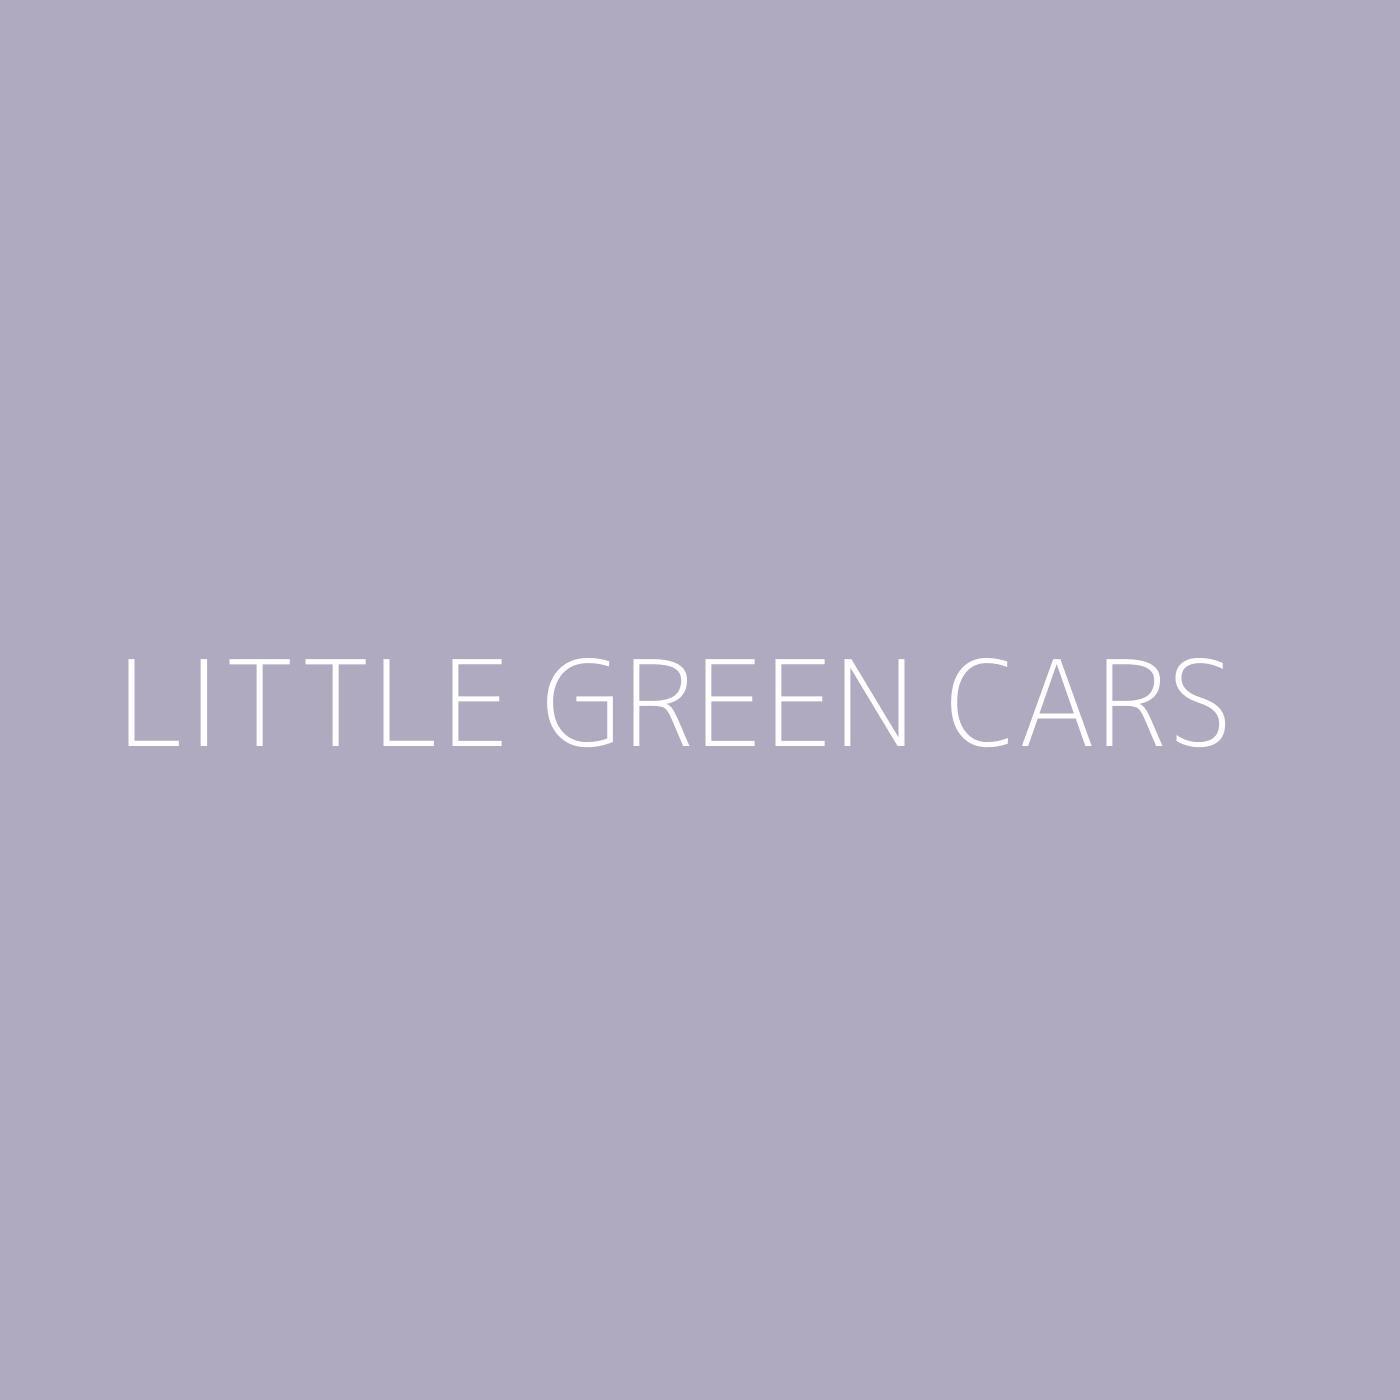 Little Green Cars Playlist Artwork